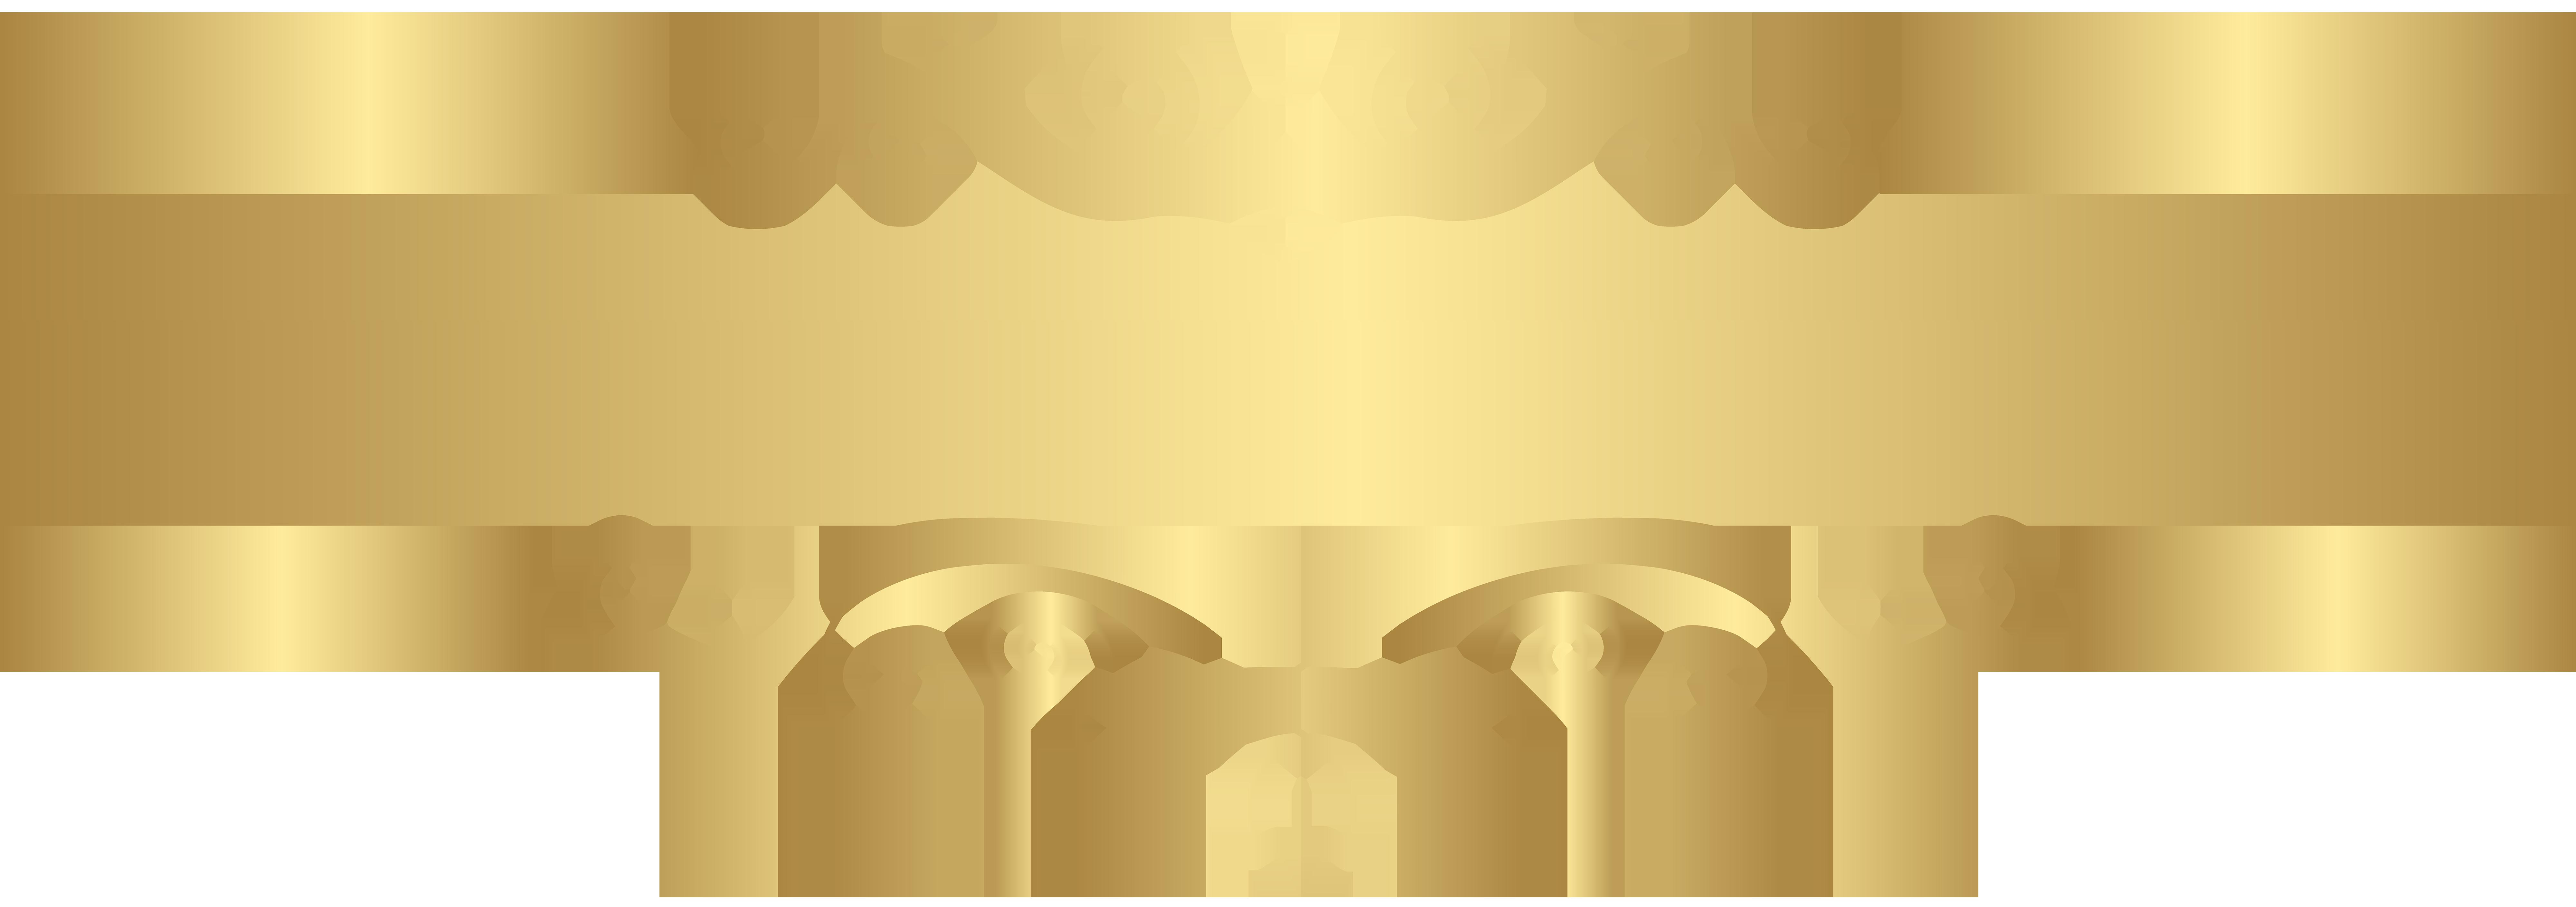 Clipart summer element. Gold decorative transparent clip